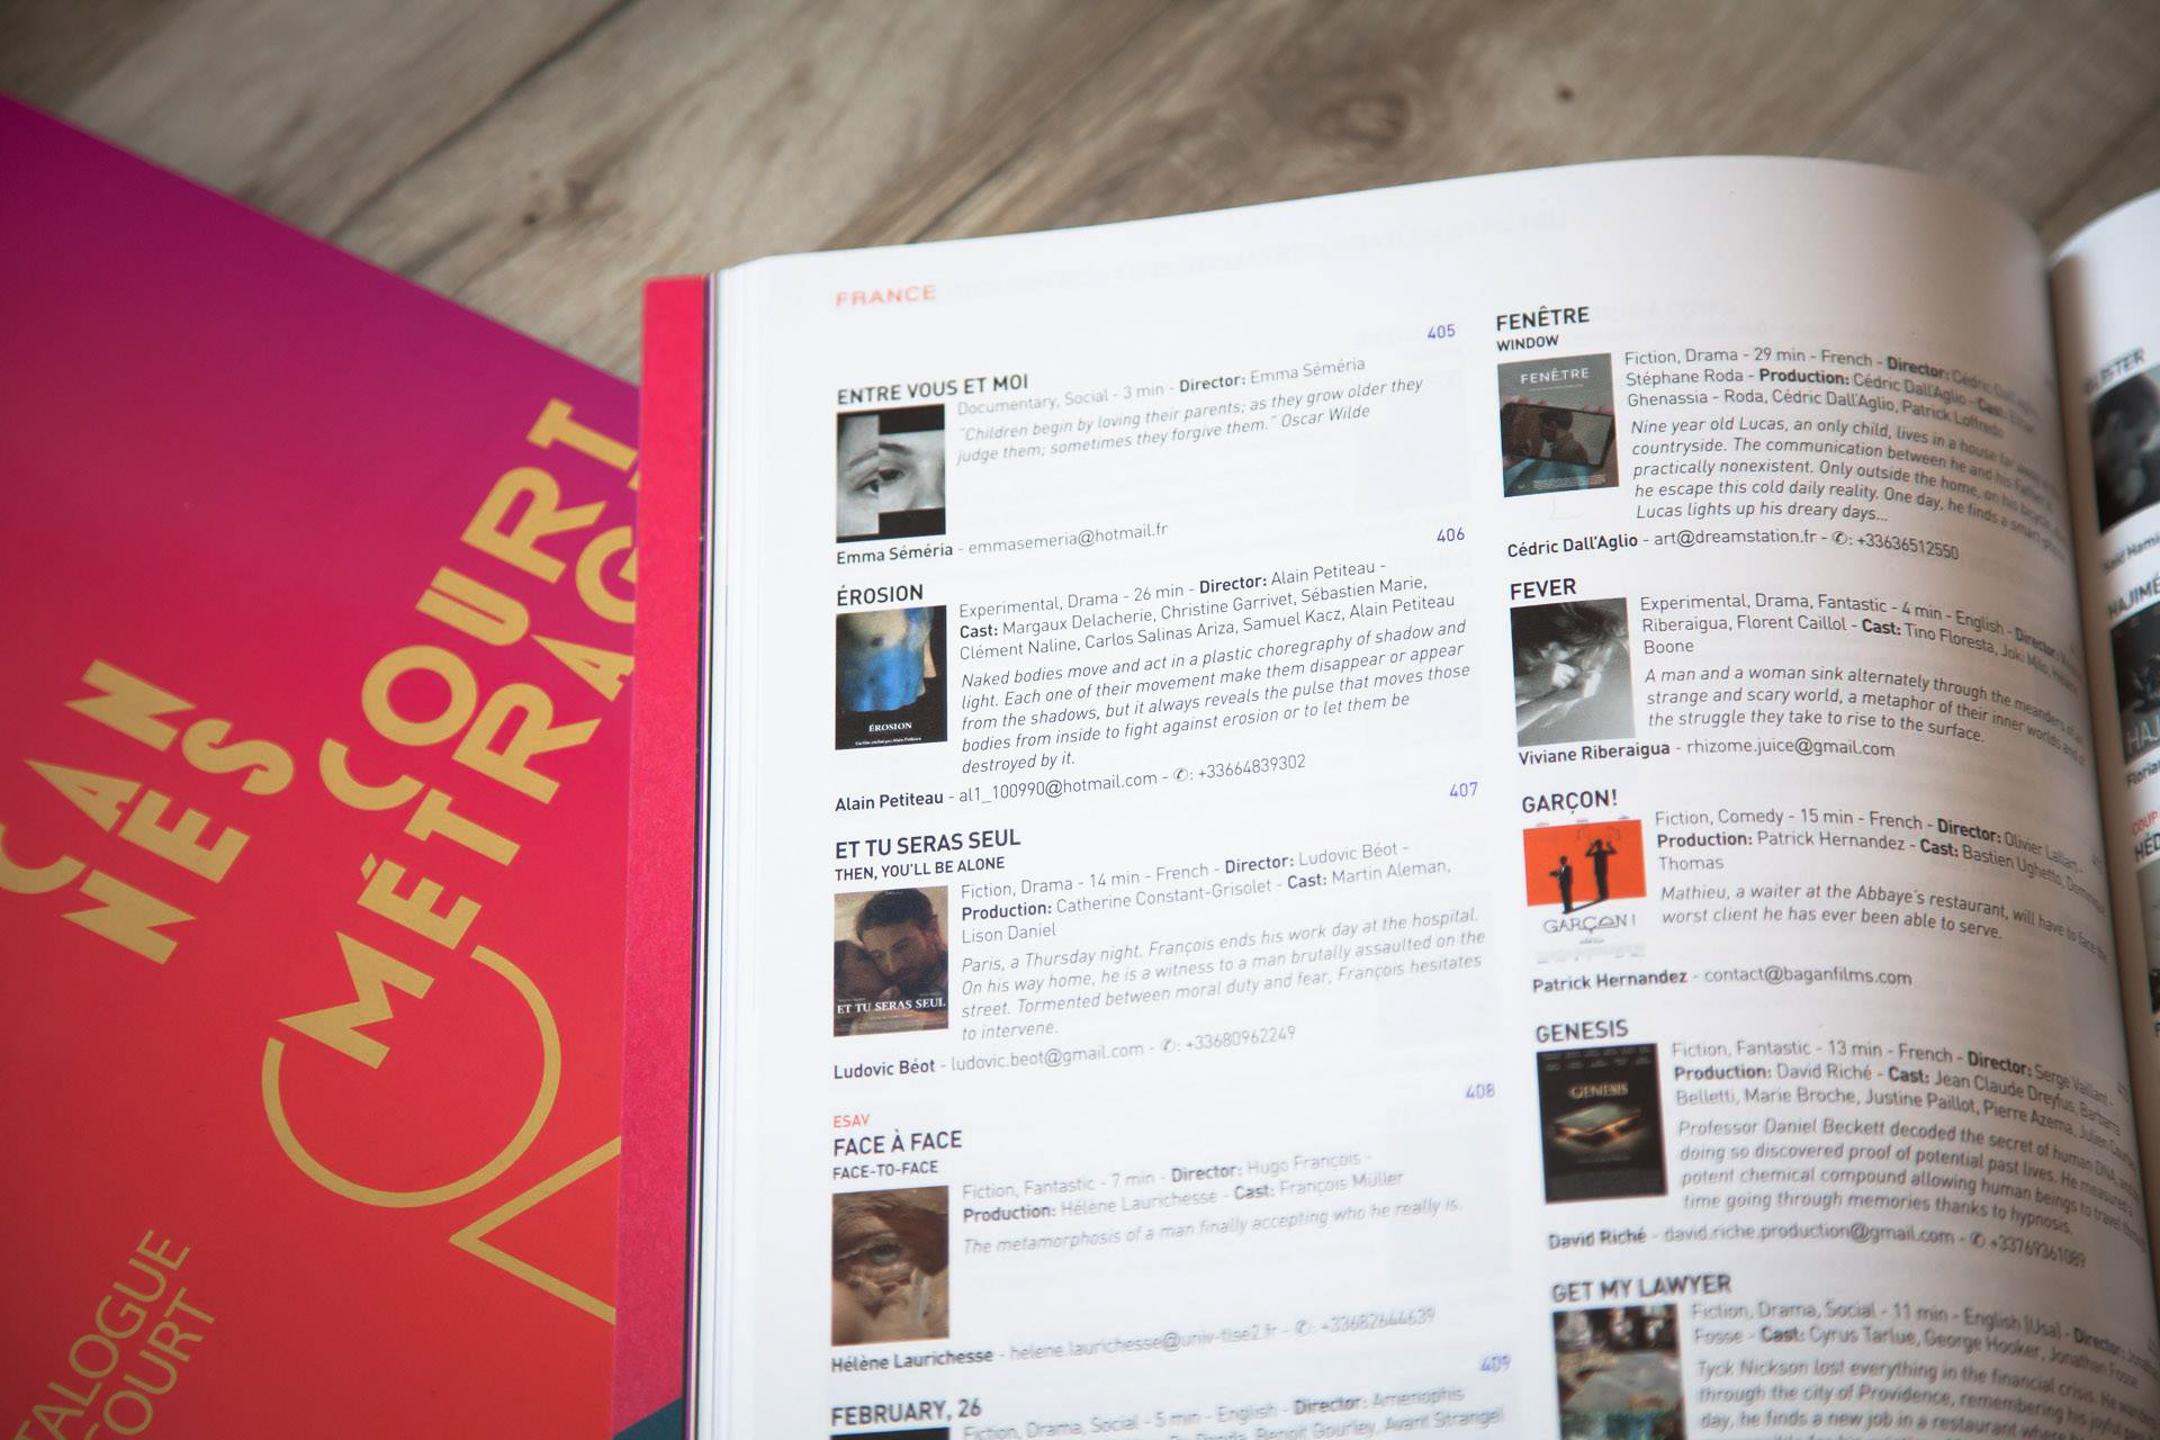 Catalogue du Film court Short Film Corner 2017 Festival de Cannes – Riberaigua Viviane 1